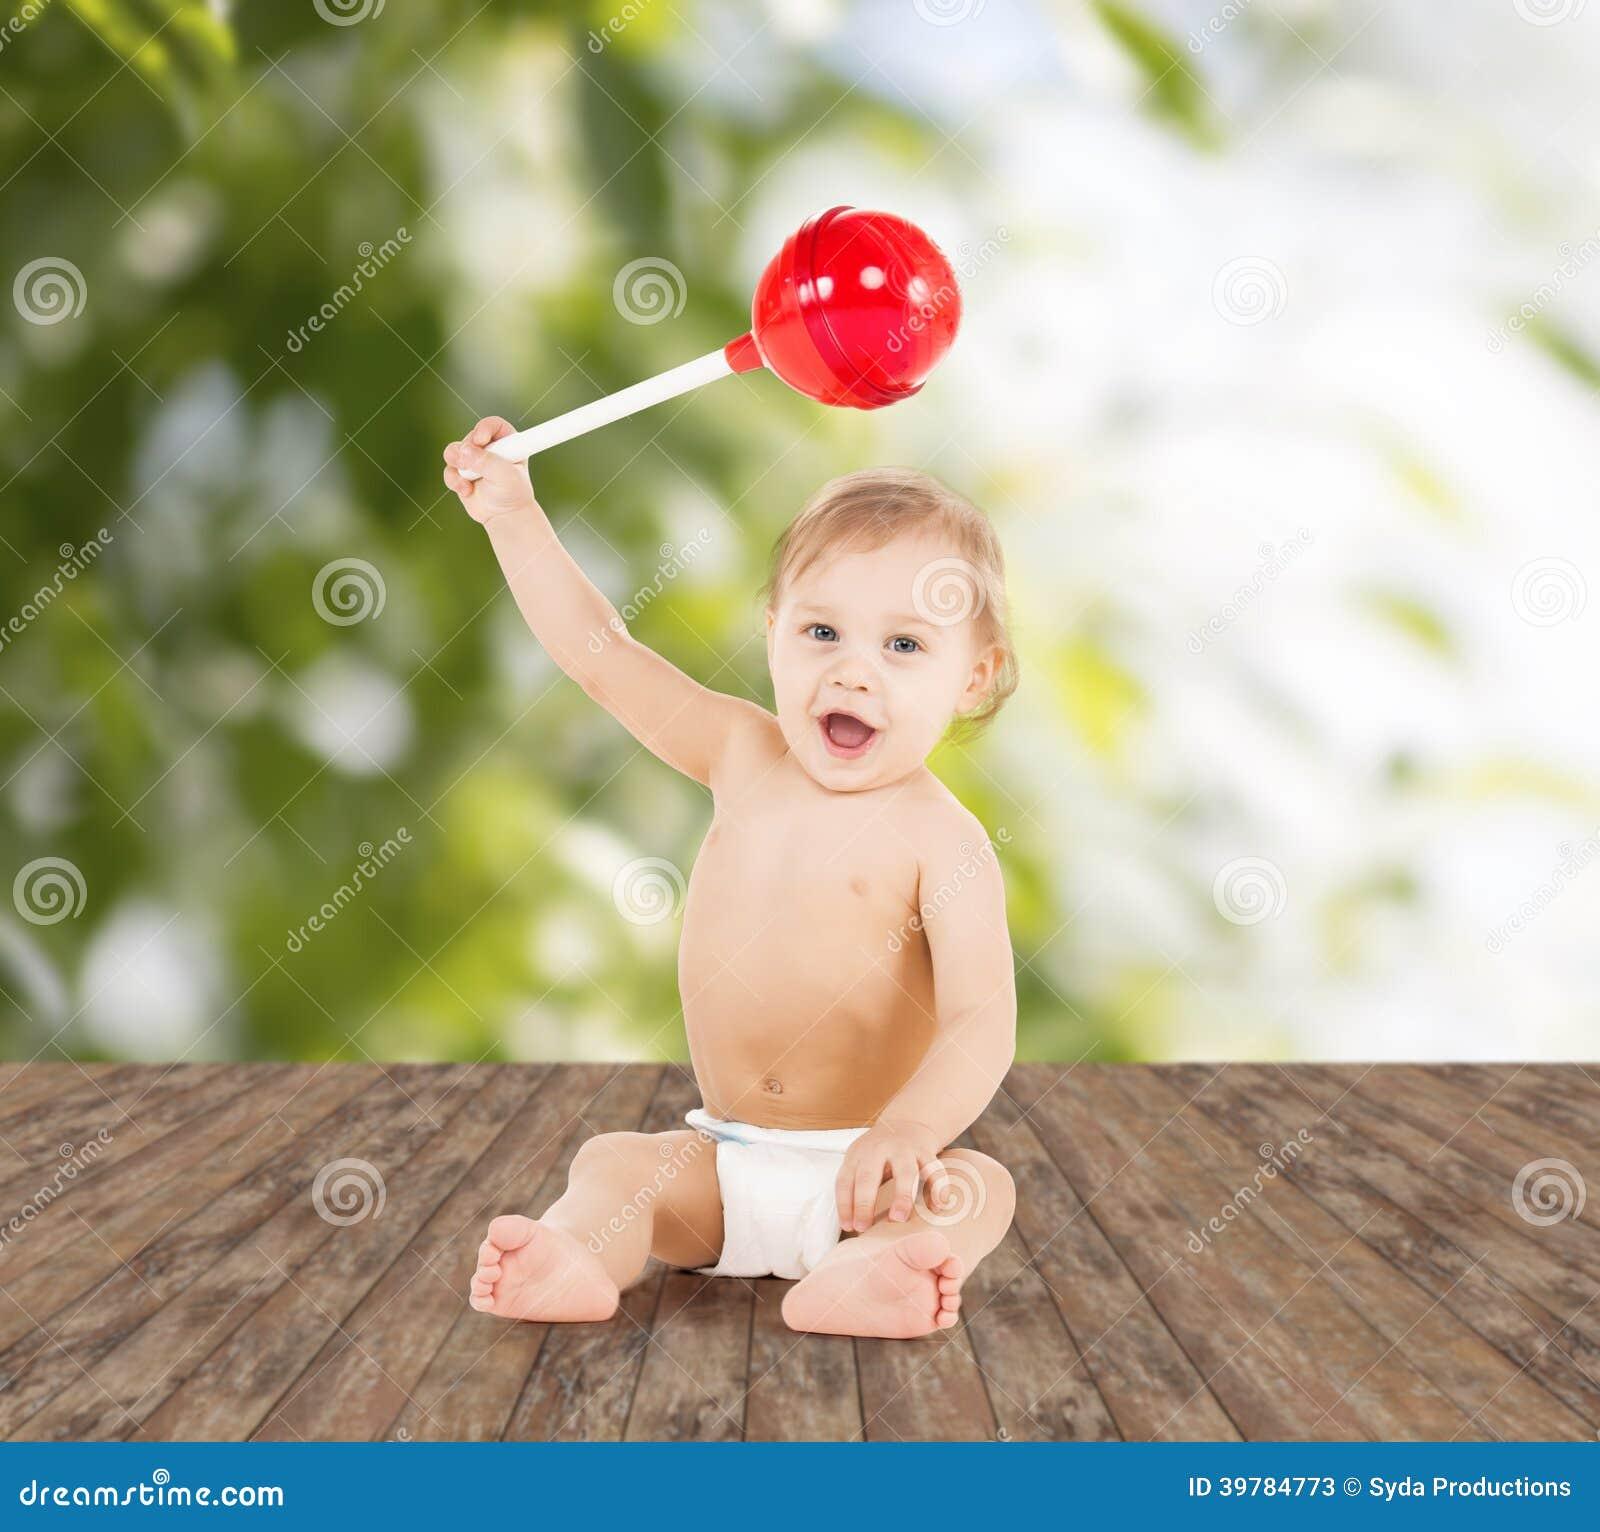 Little Big Boys Toys : Little boy with candy sucker stock photo cartoondealer